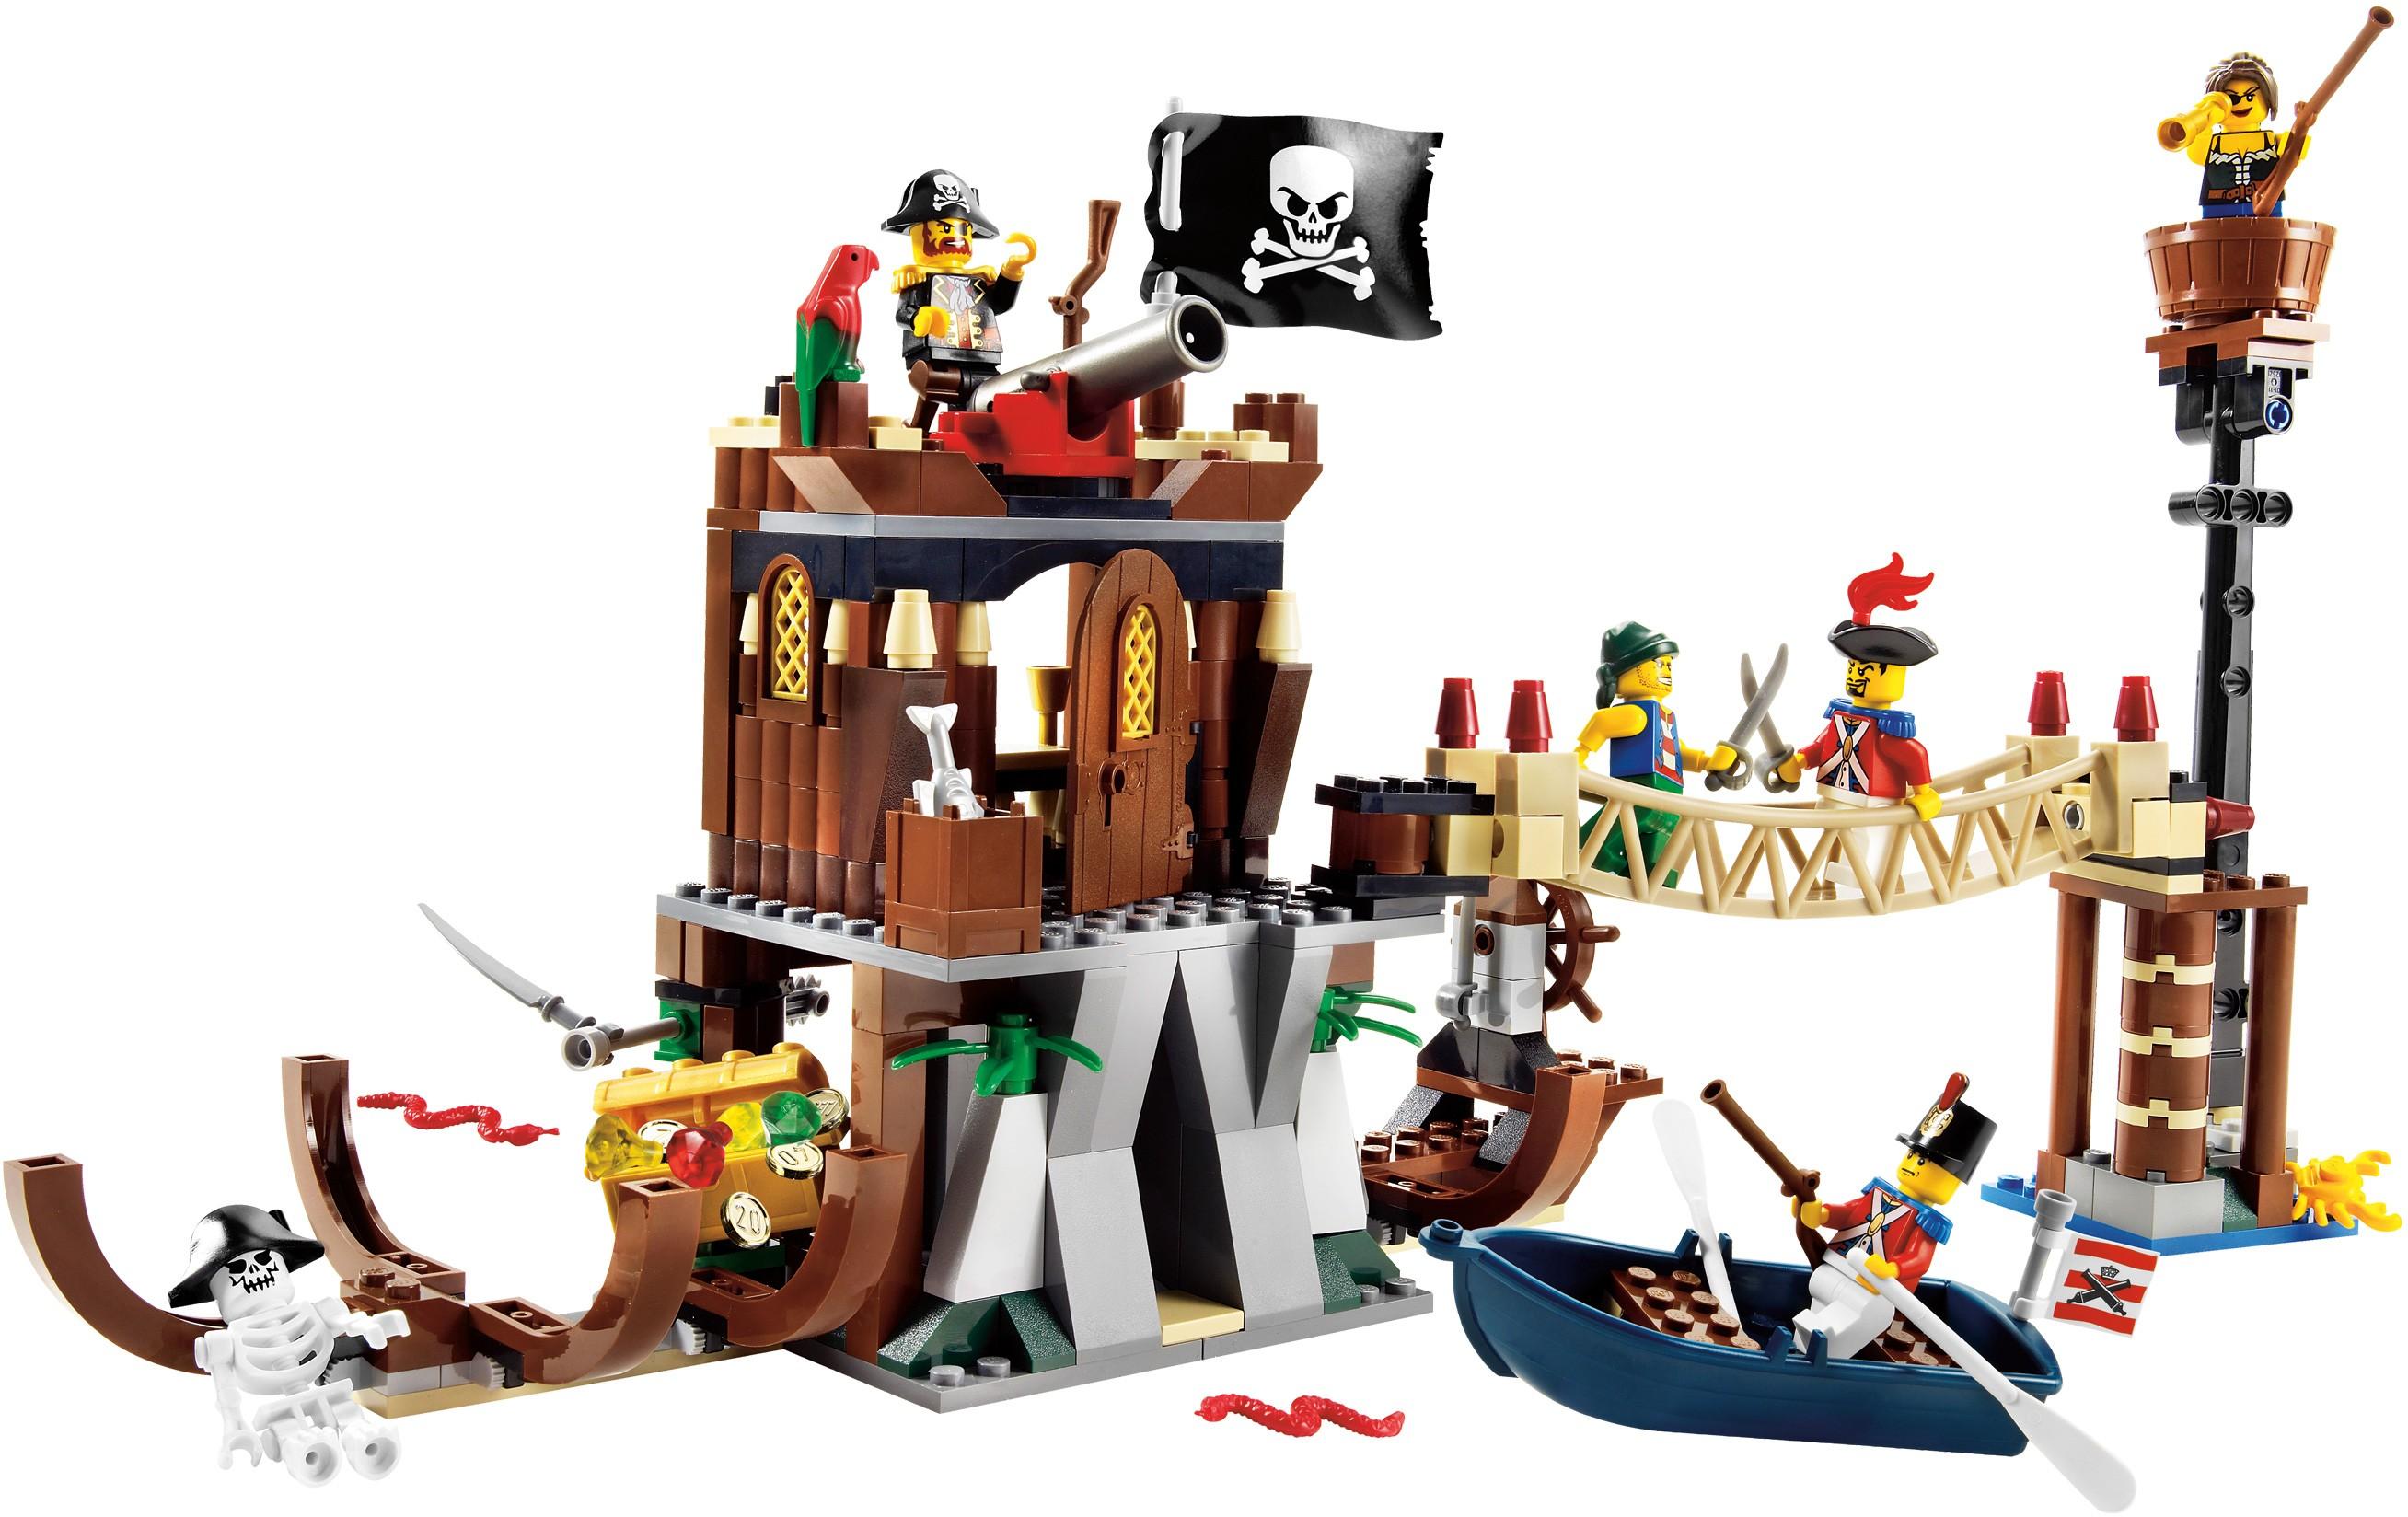 shipwreck hideout - Lego Pirate